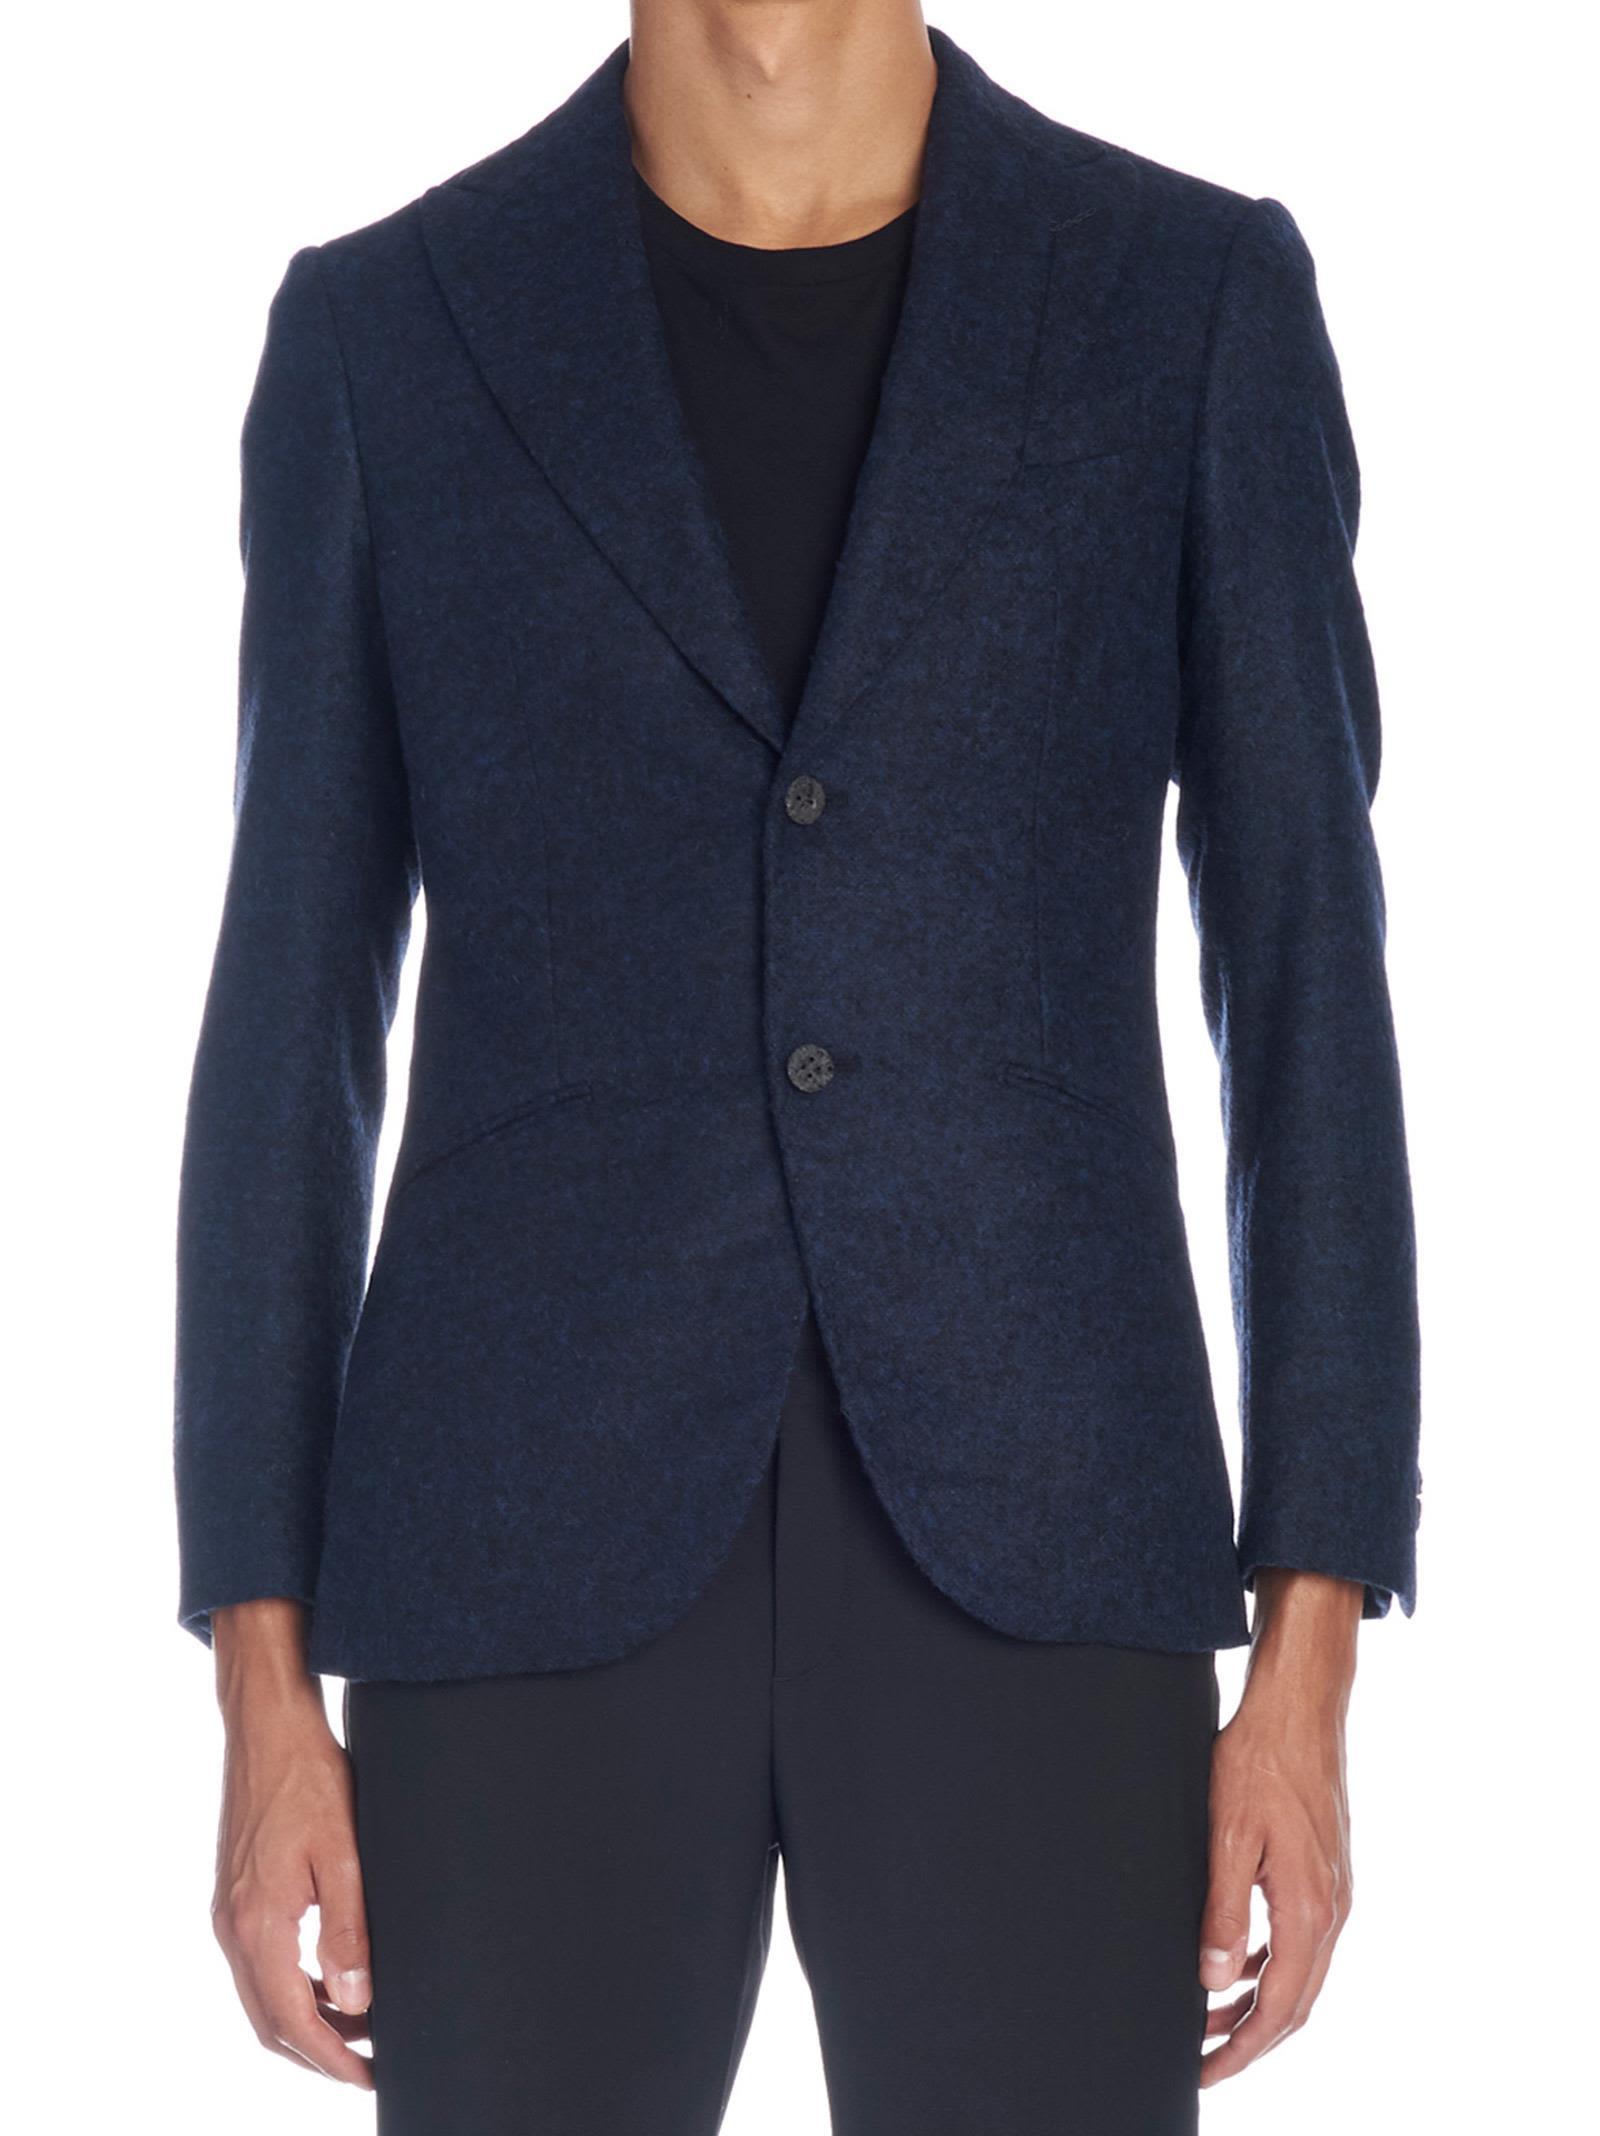 MAURIZIO MIRI Jacket in Blue